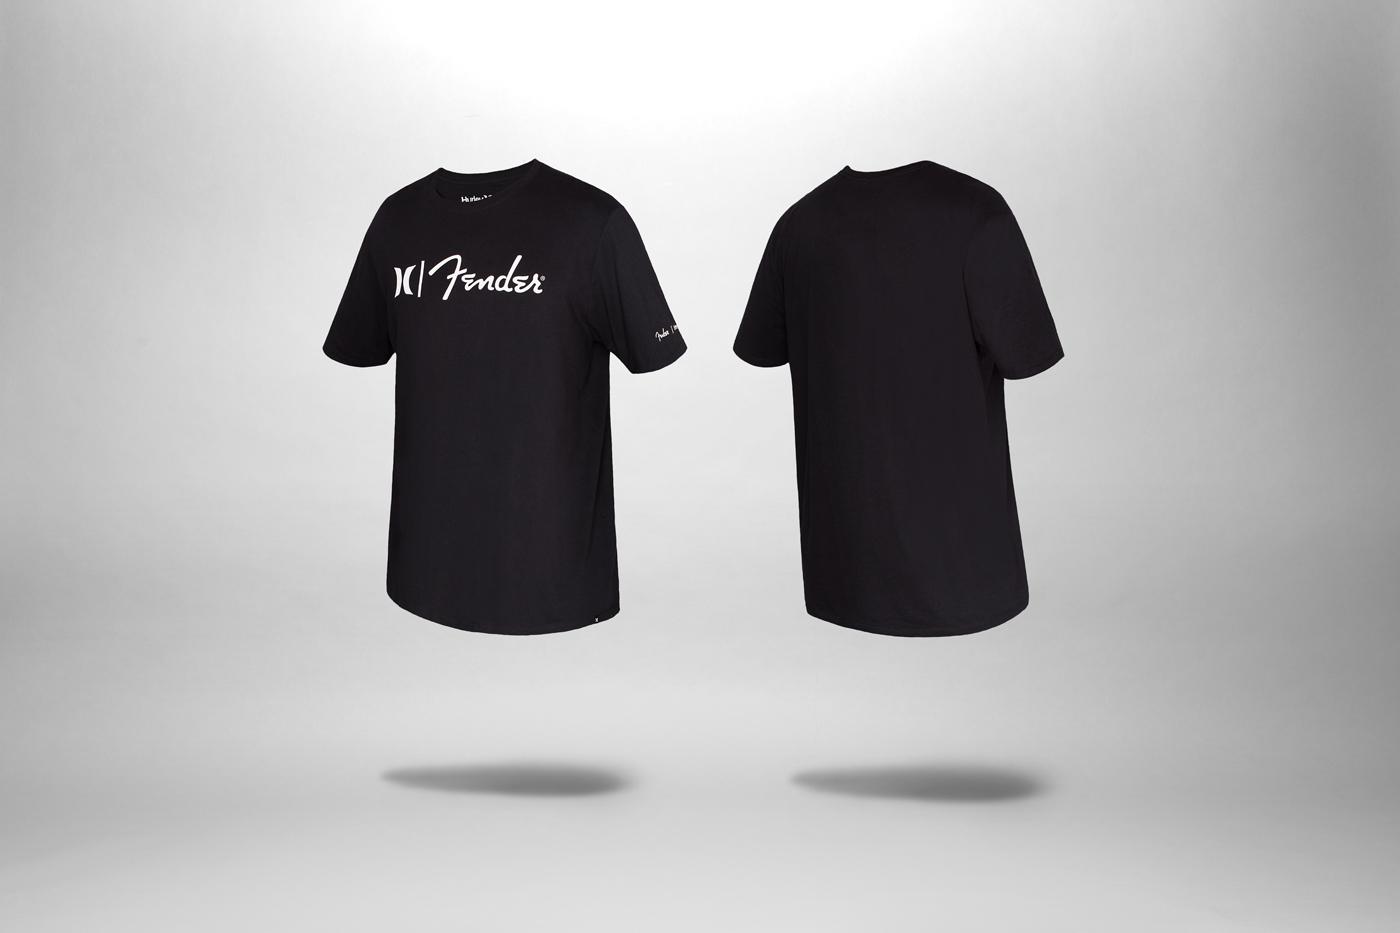 fender_blackshirt-sweep